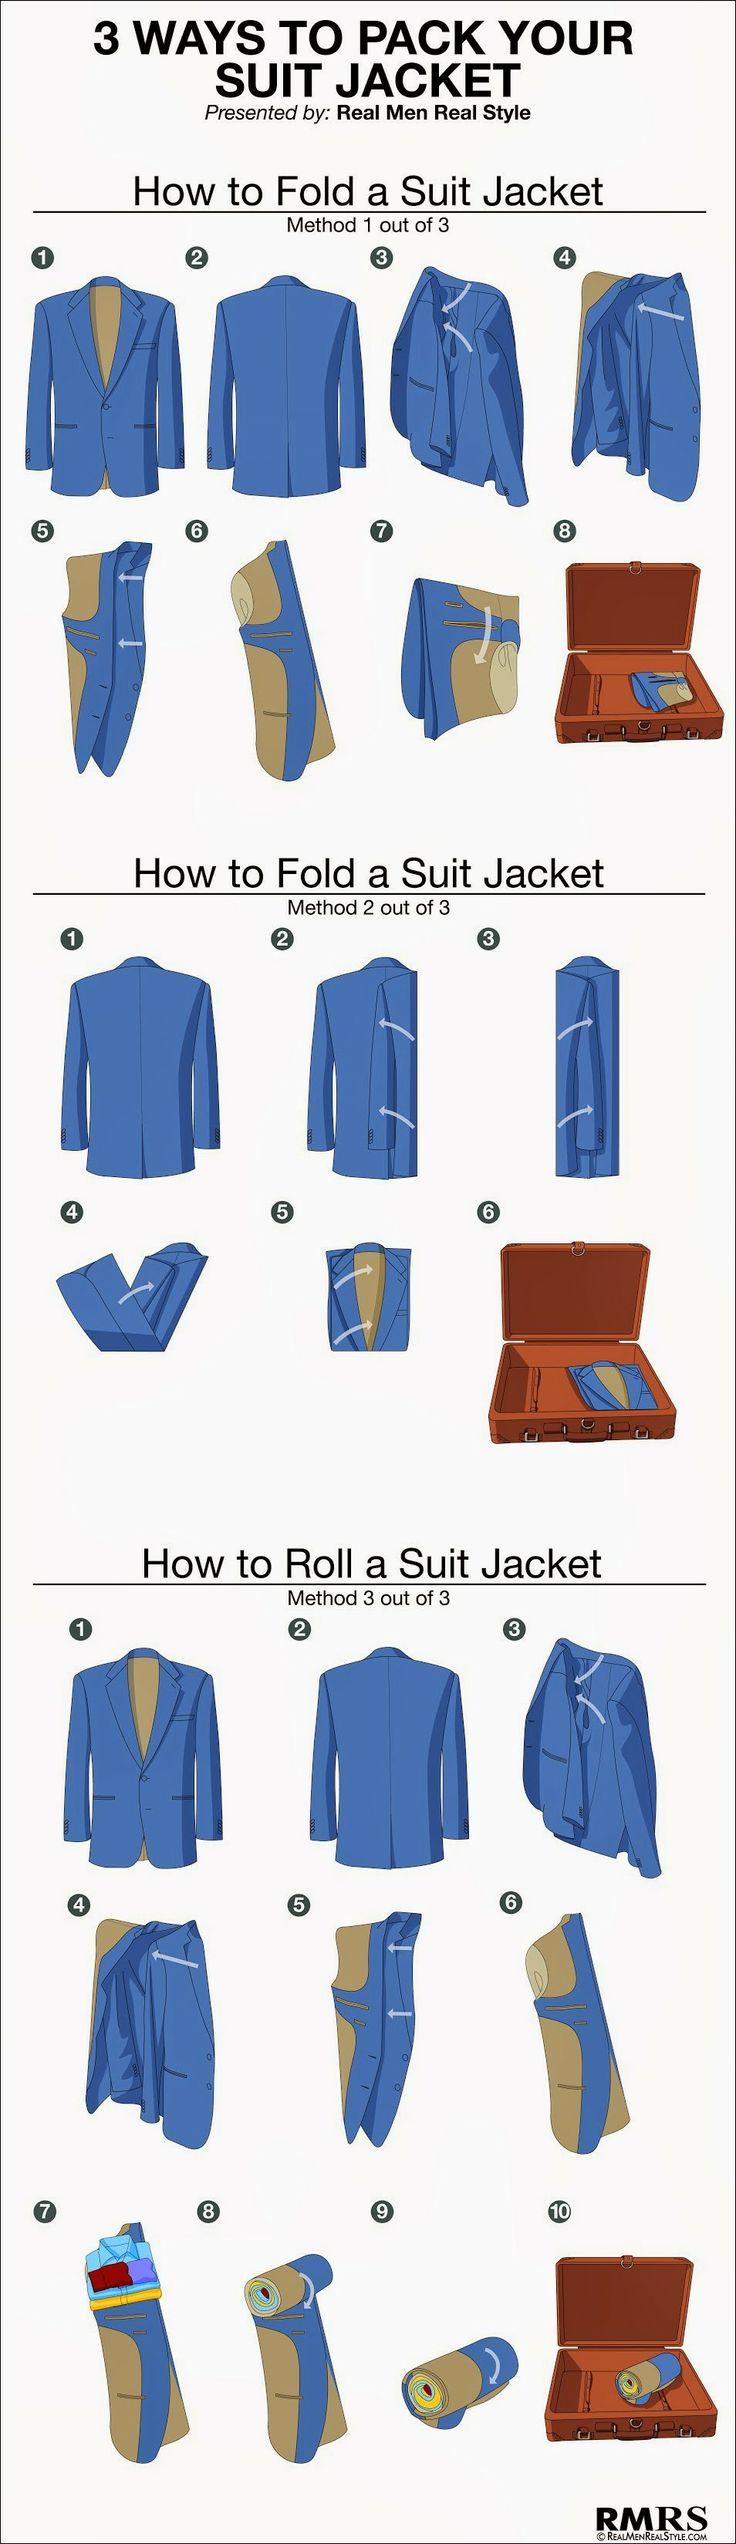 Pack your suit jacket